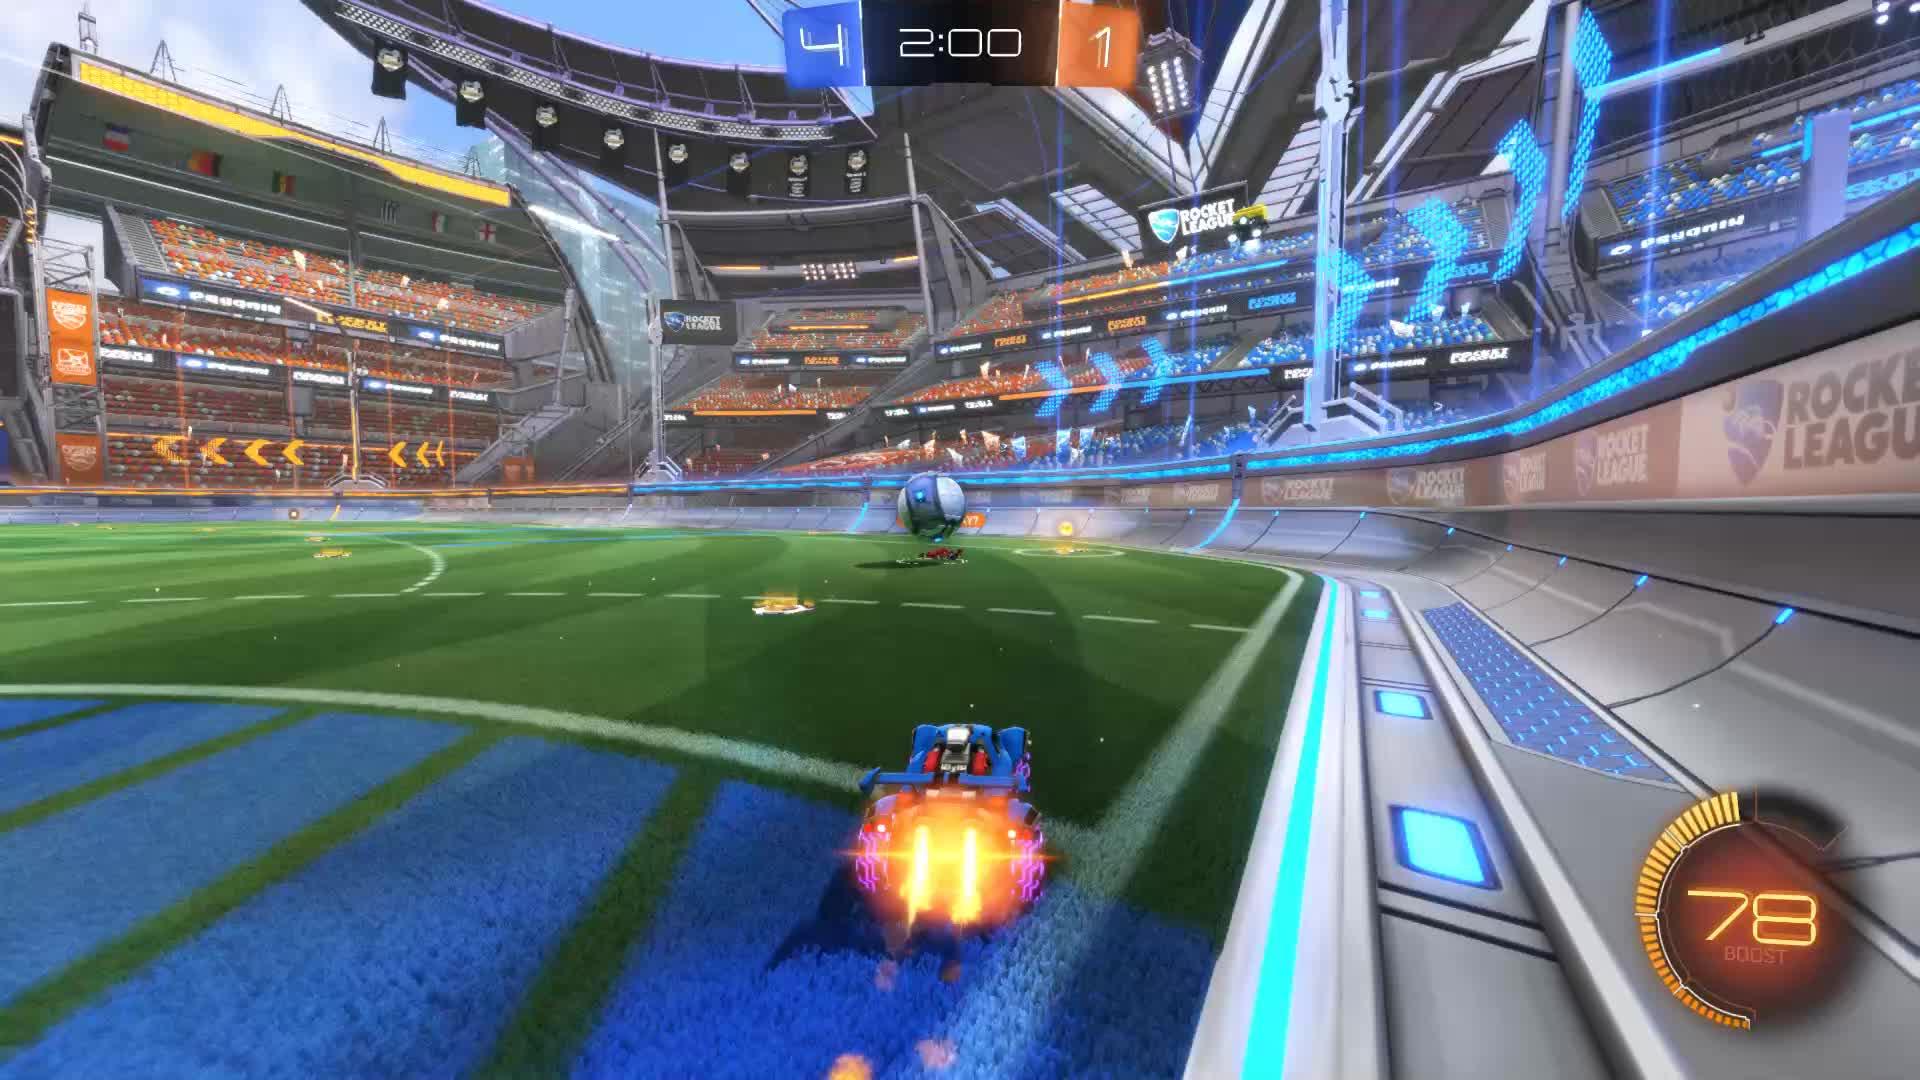 Gif Your Game, GifYourGame, Rocket League, RocketLeague, VEX Nexus, Goal 6: VEX Nexus GIFs